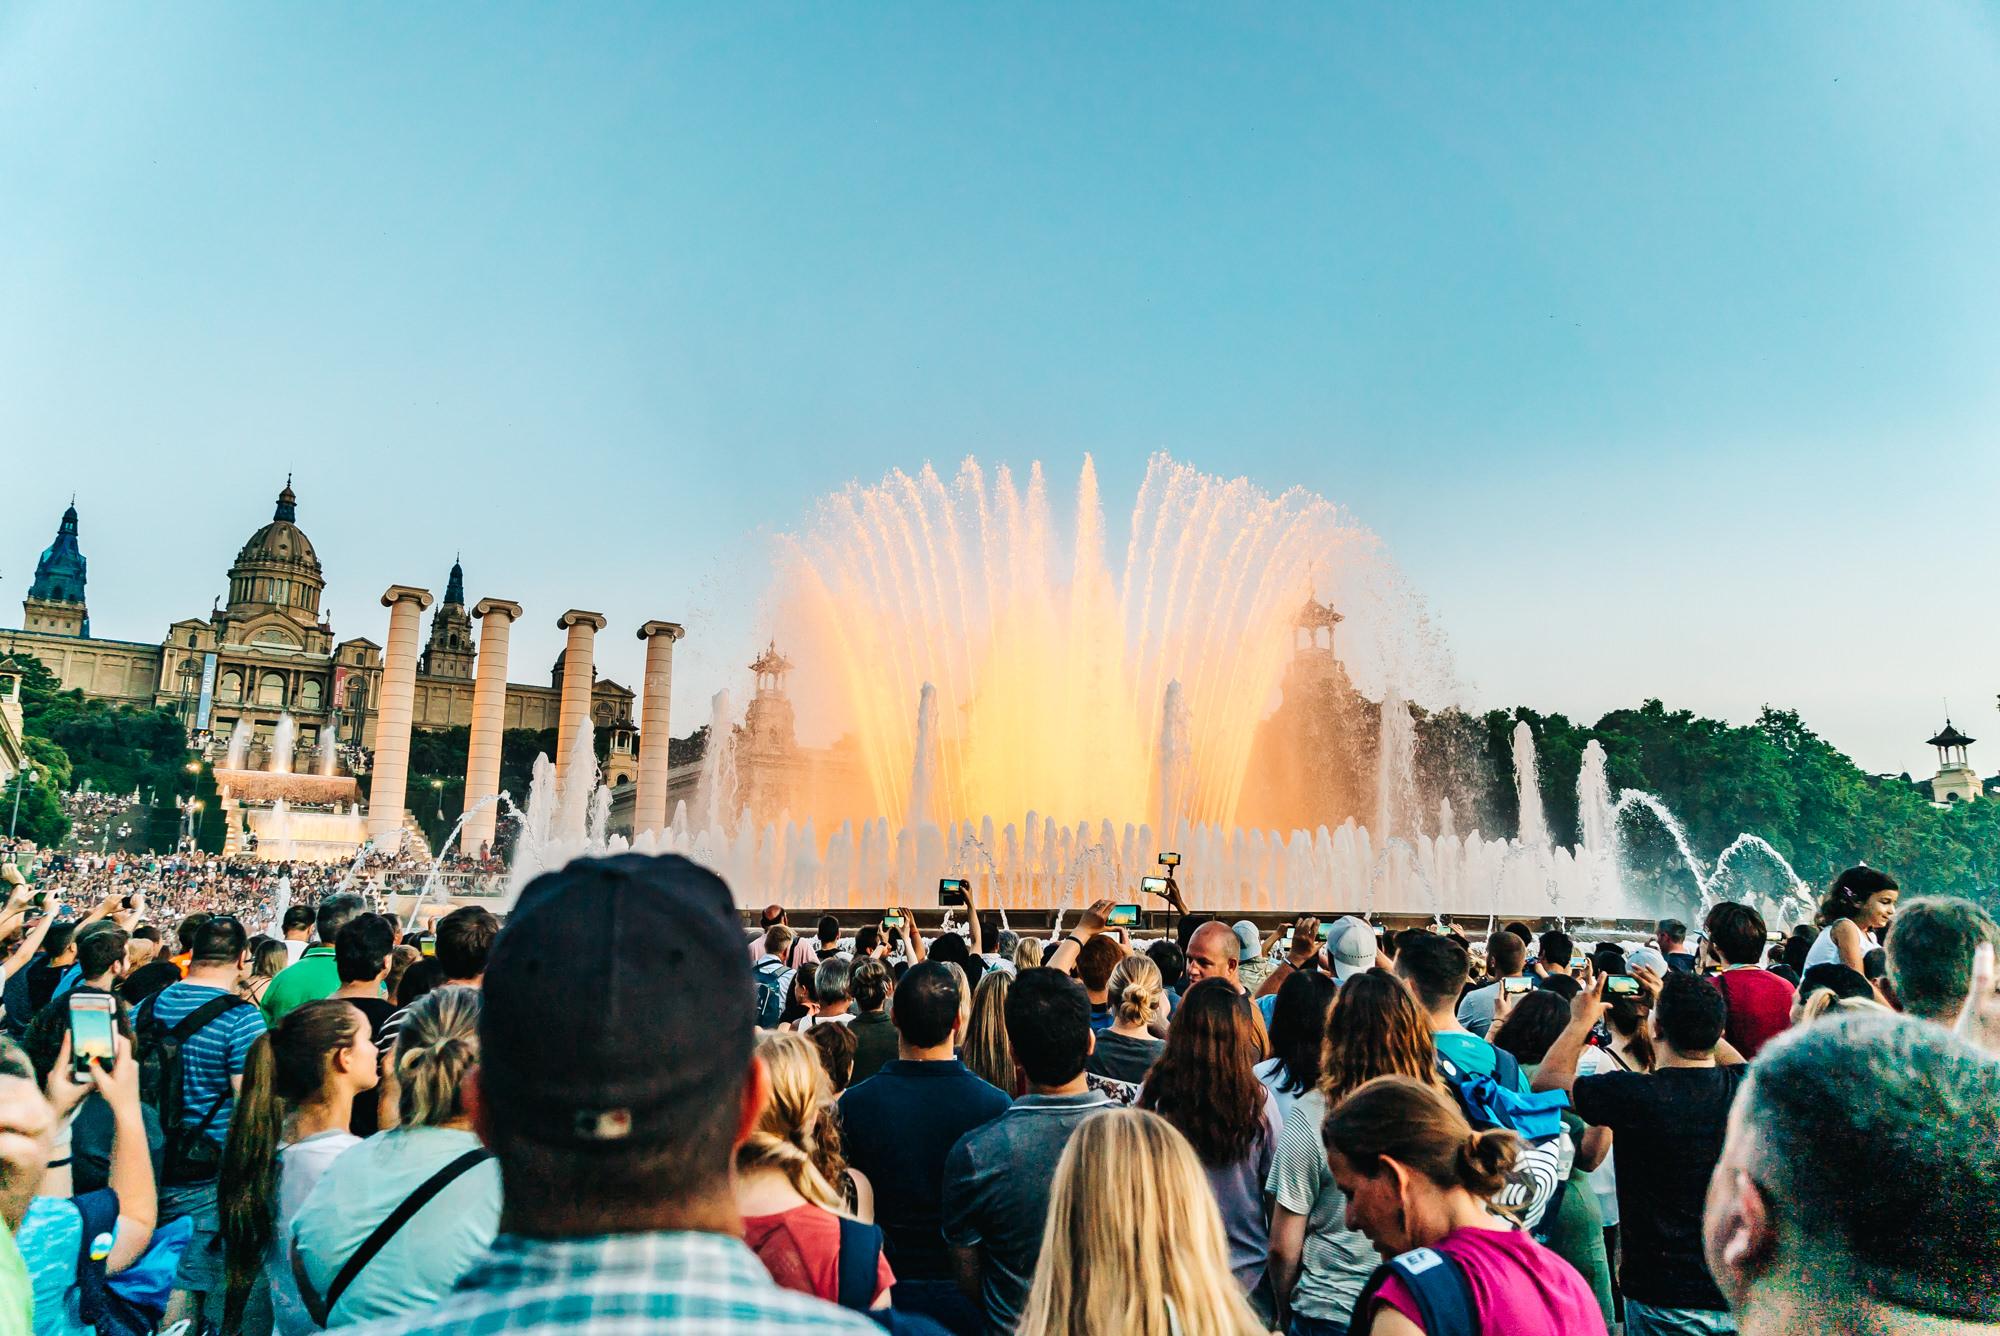 Magic Water Fountain in Barcelona